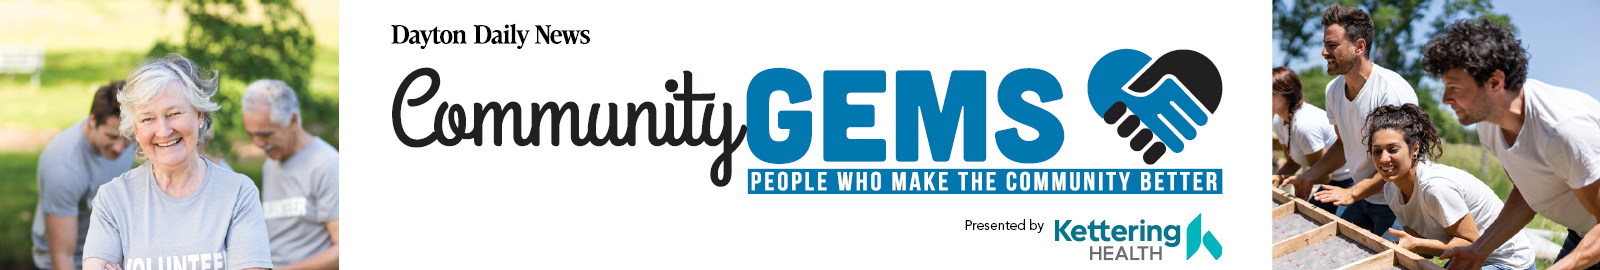 Community Gems Header